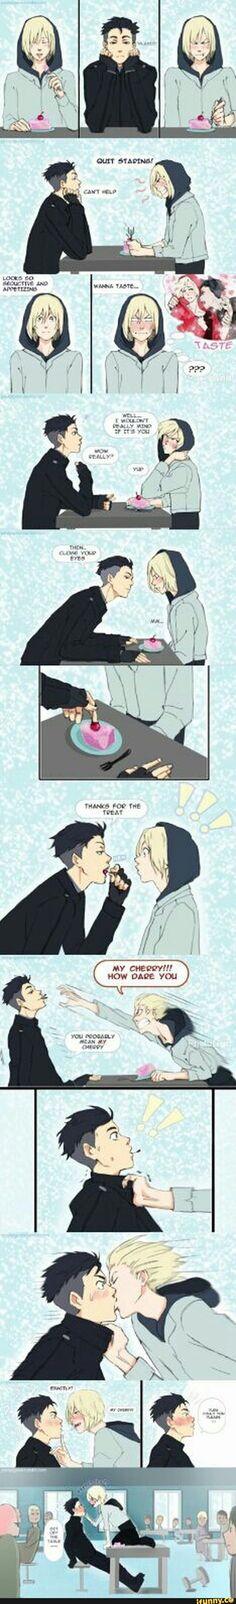 Seems like something Yurio would do xD: